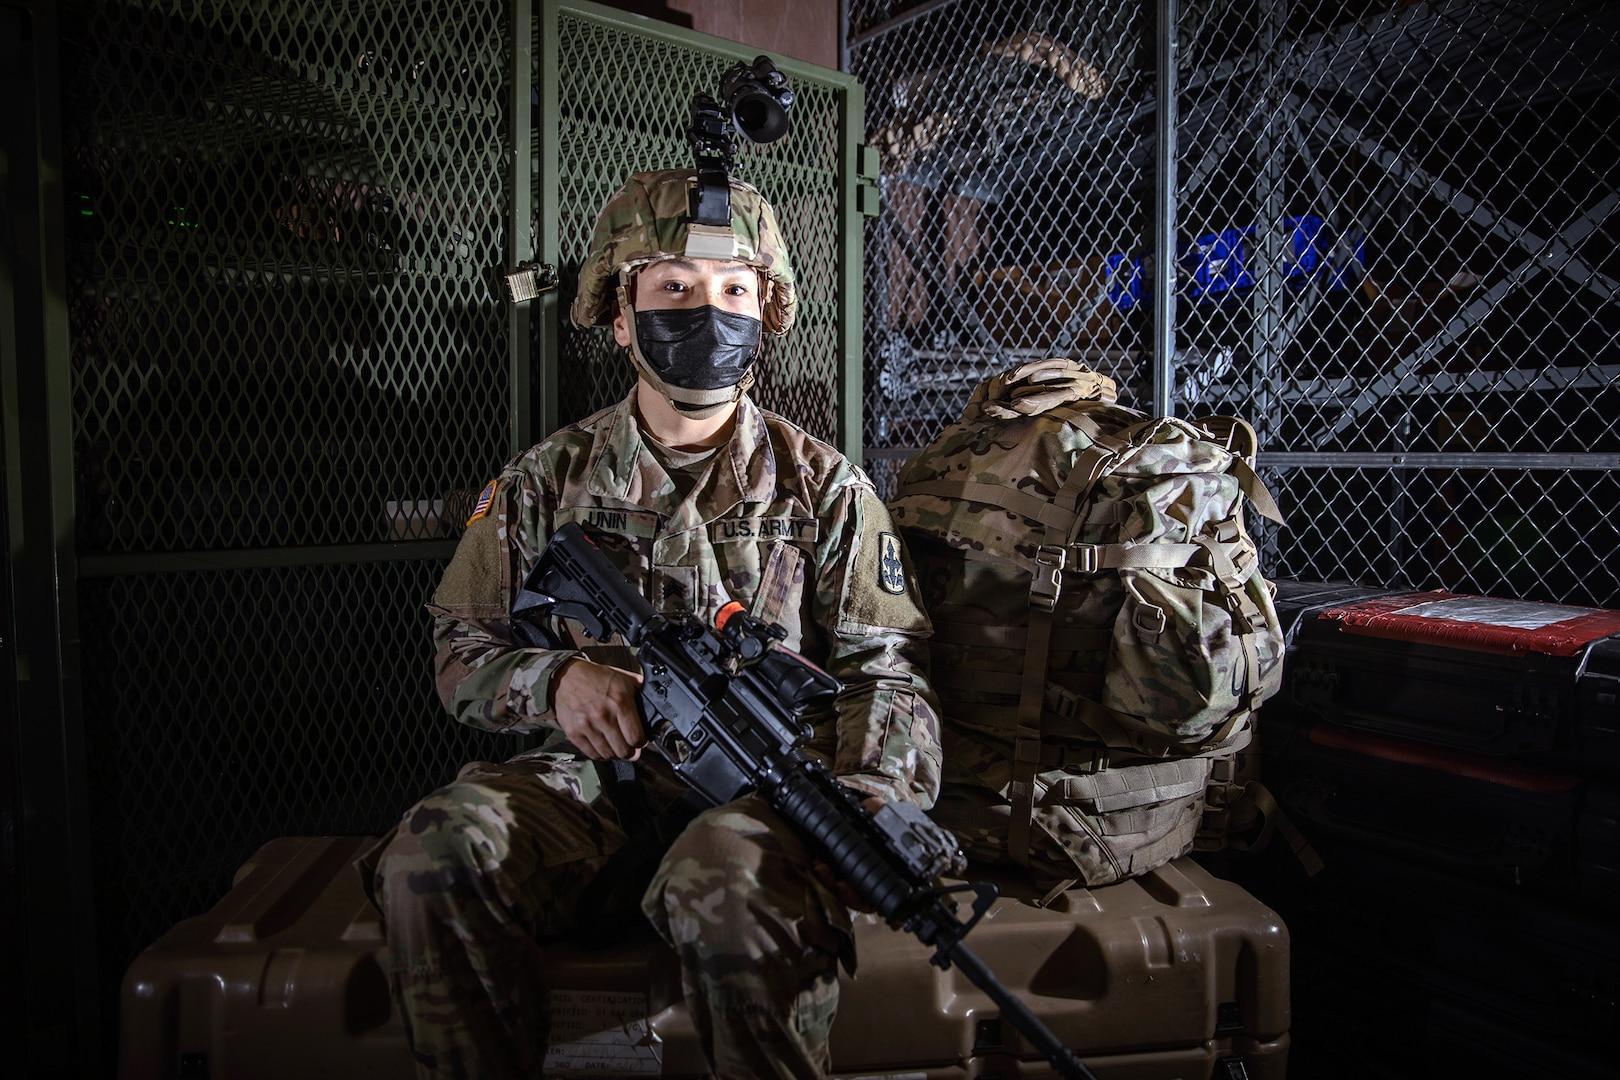 Alaska Army National Guard Infantrywoman Makes History